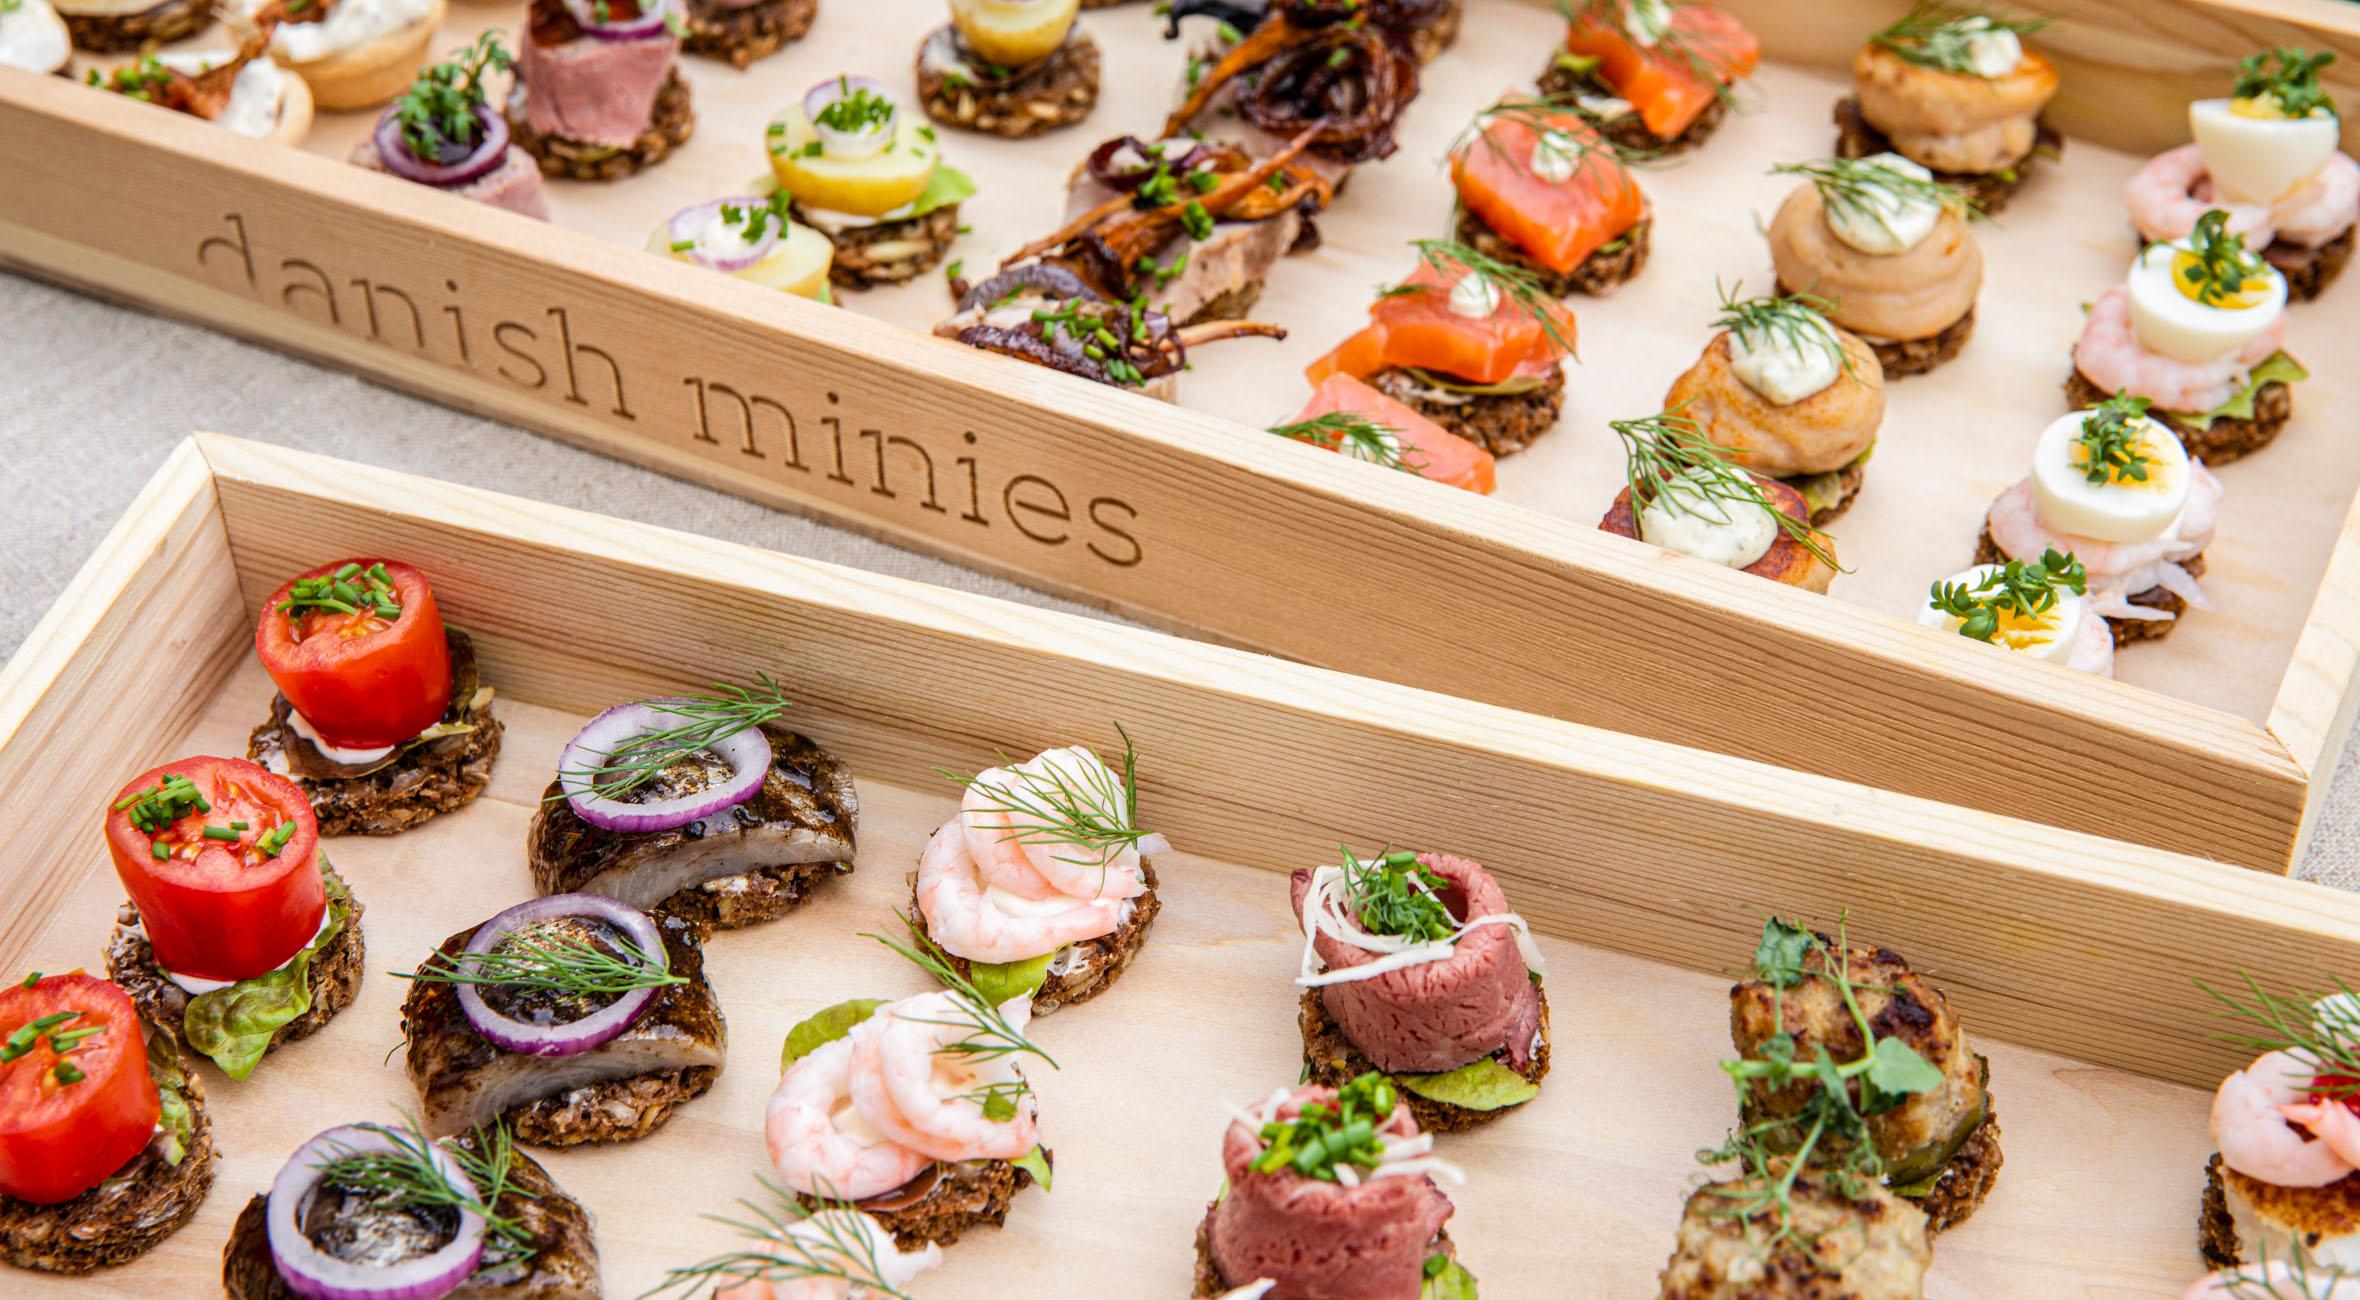 15 mini-smørrebrød fra Danish Minies – Byd dine gæster på smørrebrød i miniformat og få alt fra tatar til hønsesalat, fiskefilet, røget Fanø-laks og mørbrad med kantareller